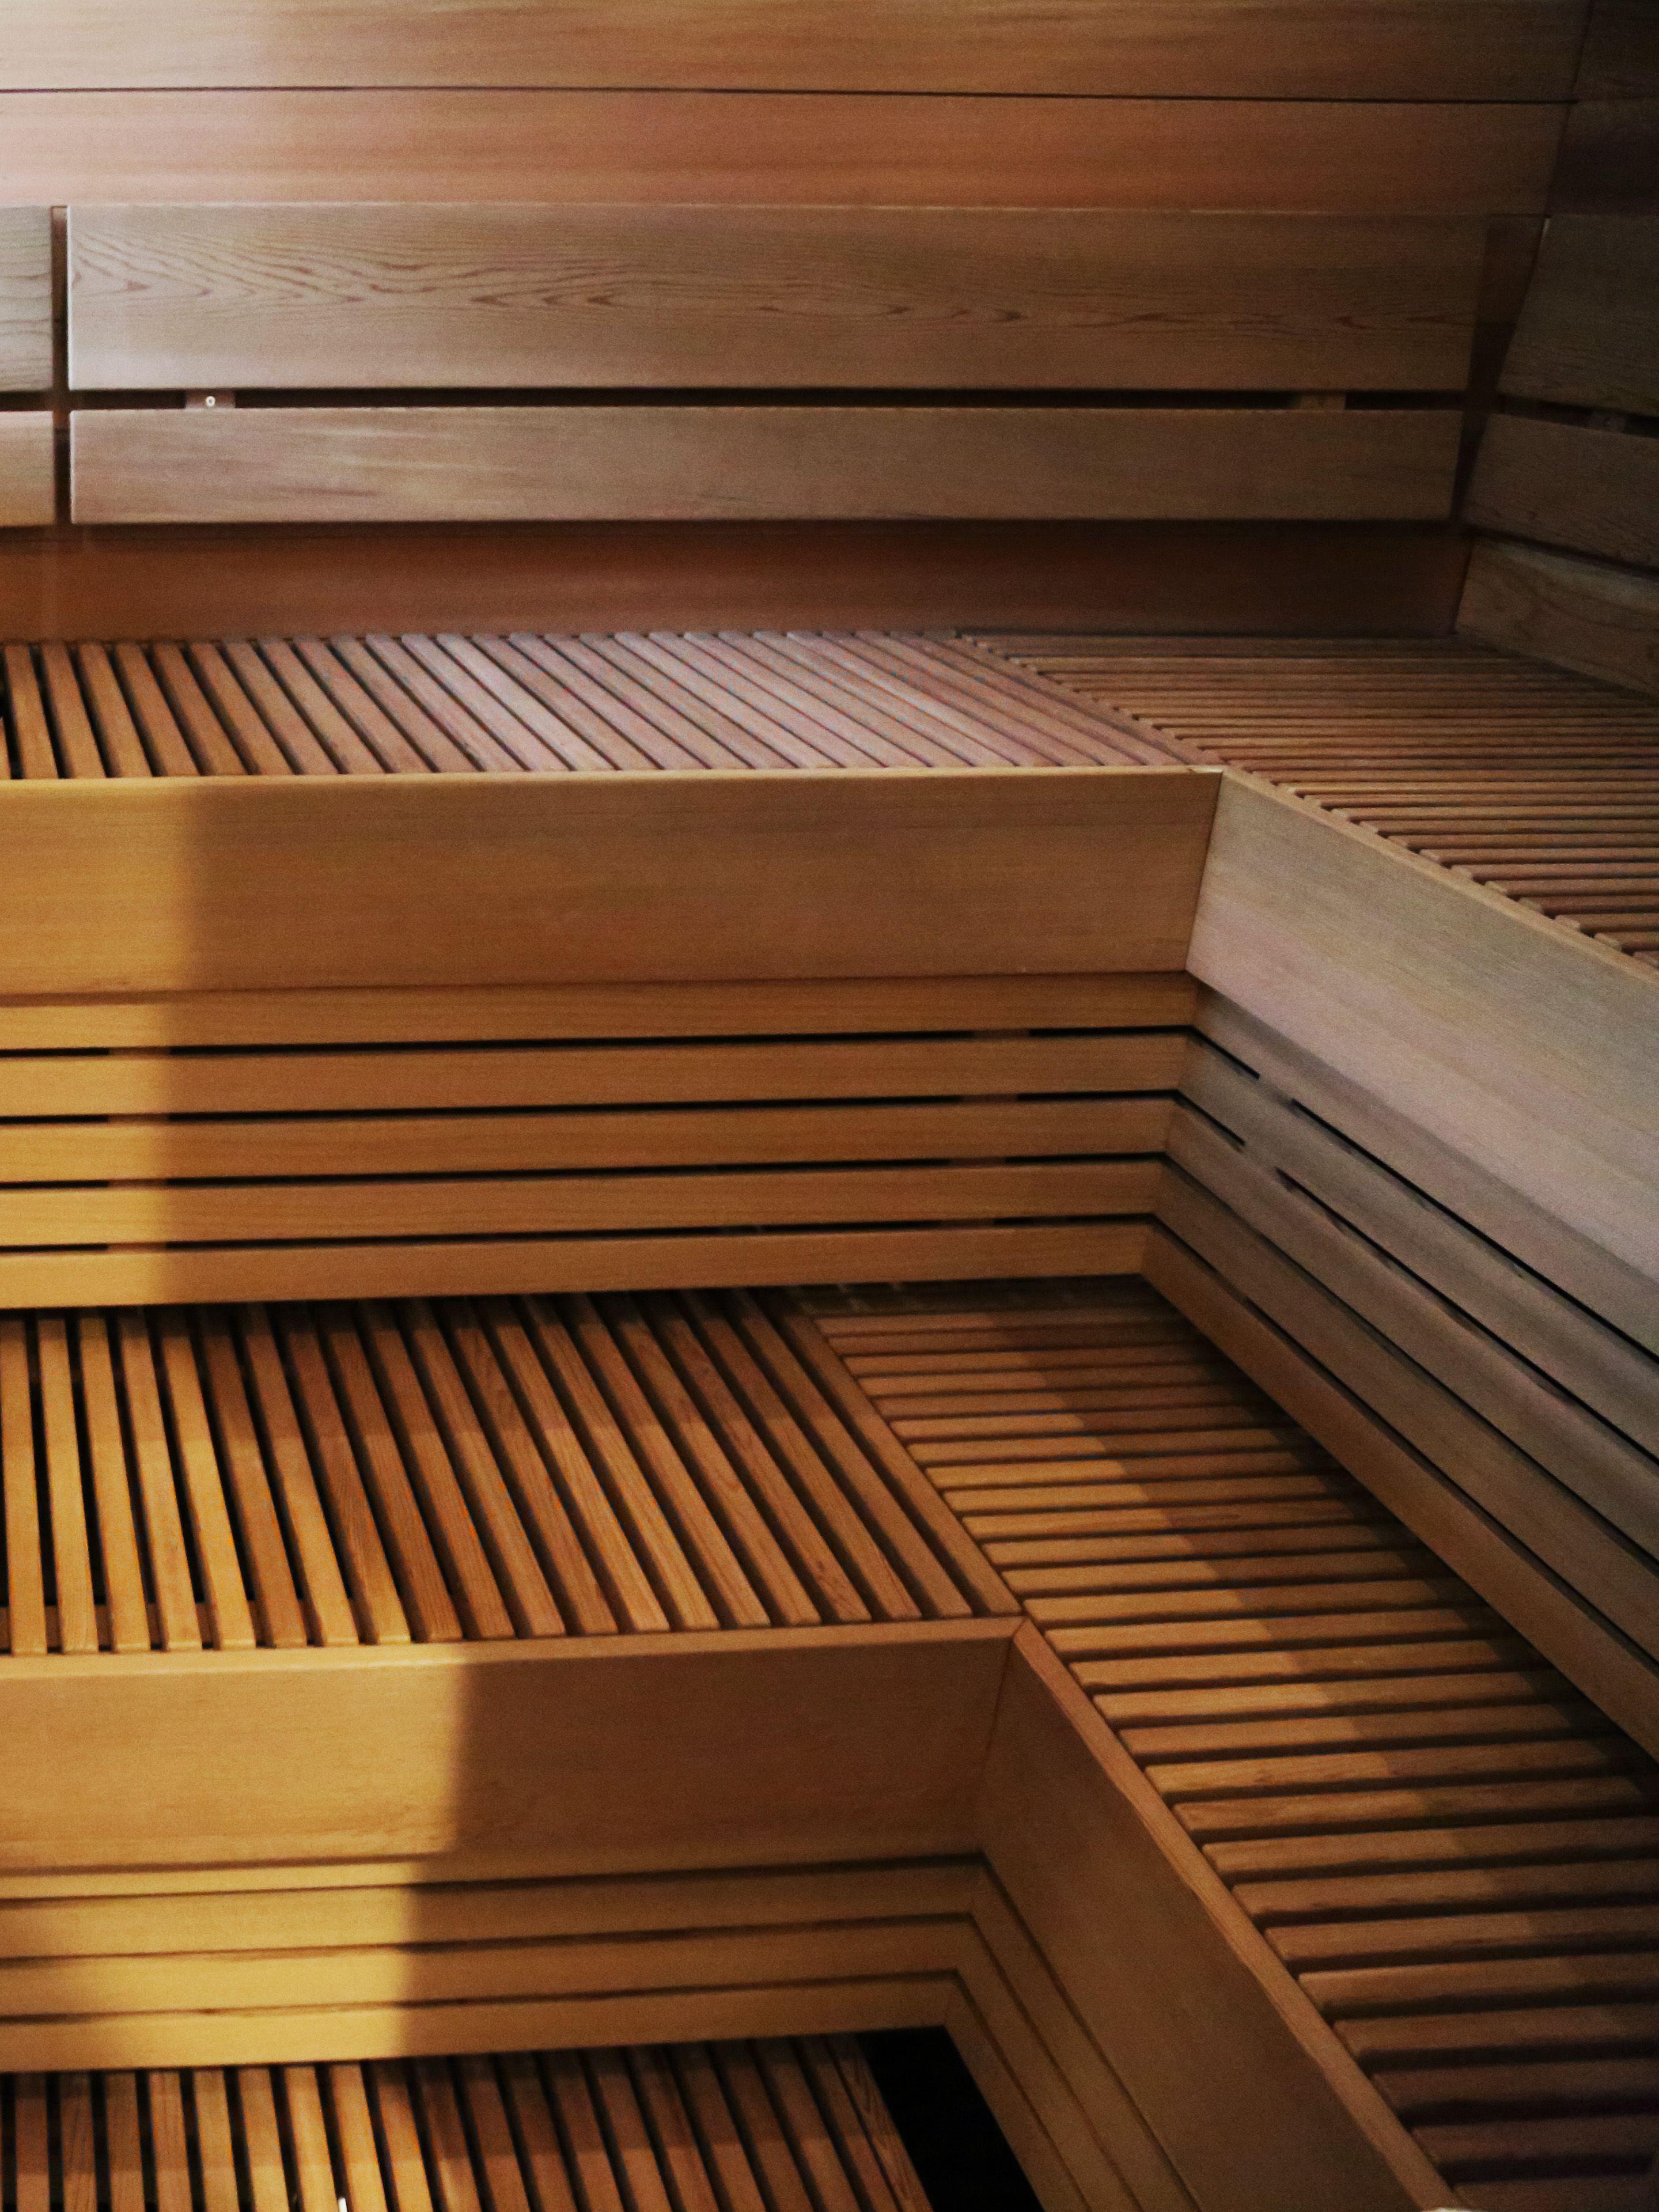 Find Your Inspiration From Those Beautiful Sauna Benches Sawo Sawosauna Saunabenches Lauteet Sauna Sauna Design Sauna Steam Room Modern Saunas